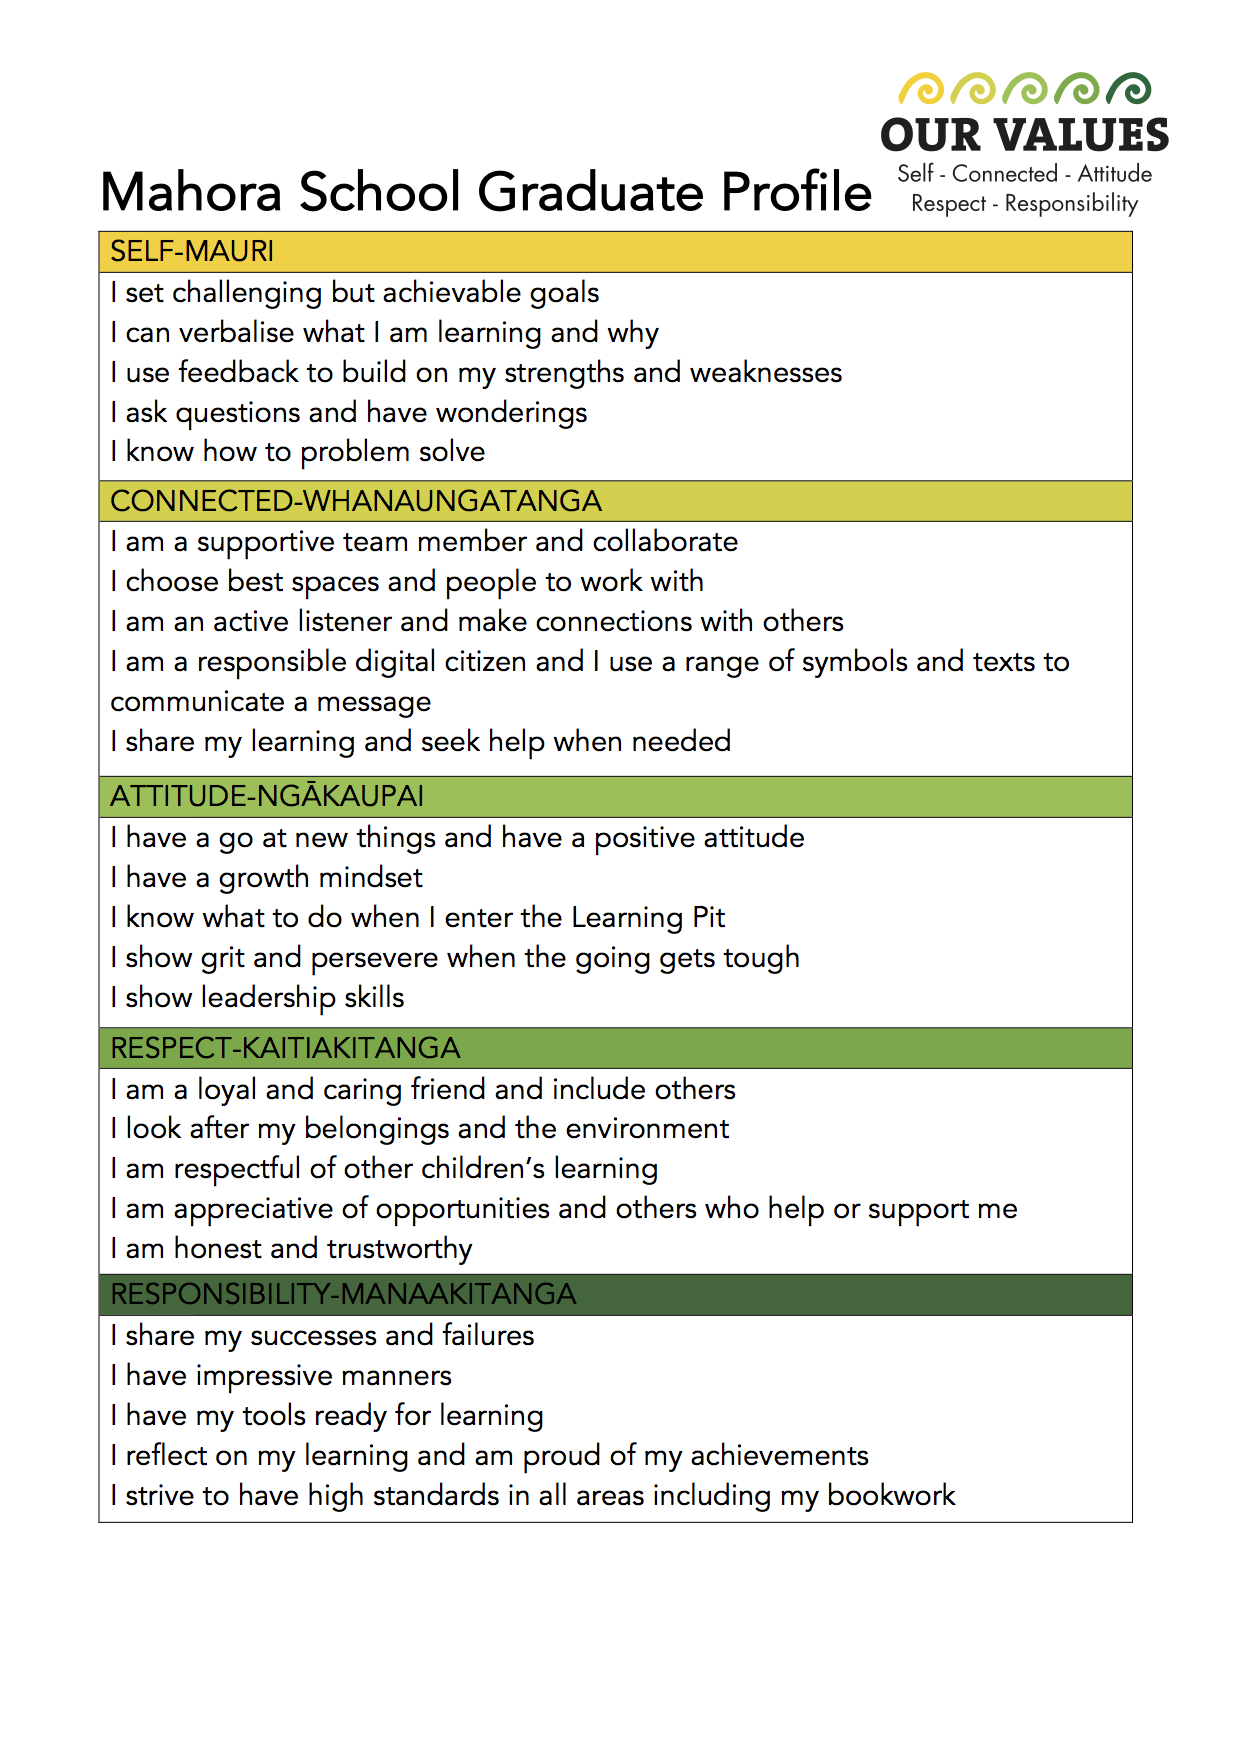 Microsoft Word - Mahora School Graduate Profile modified 16 May 2017.jpg